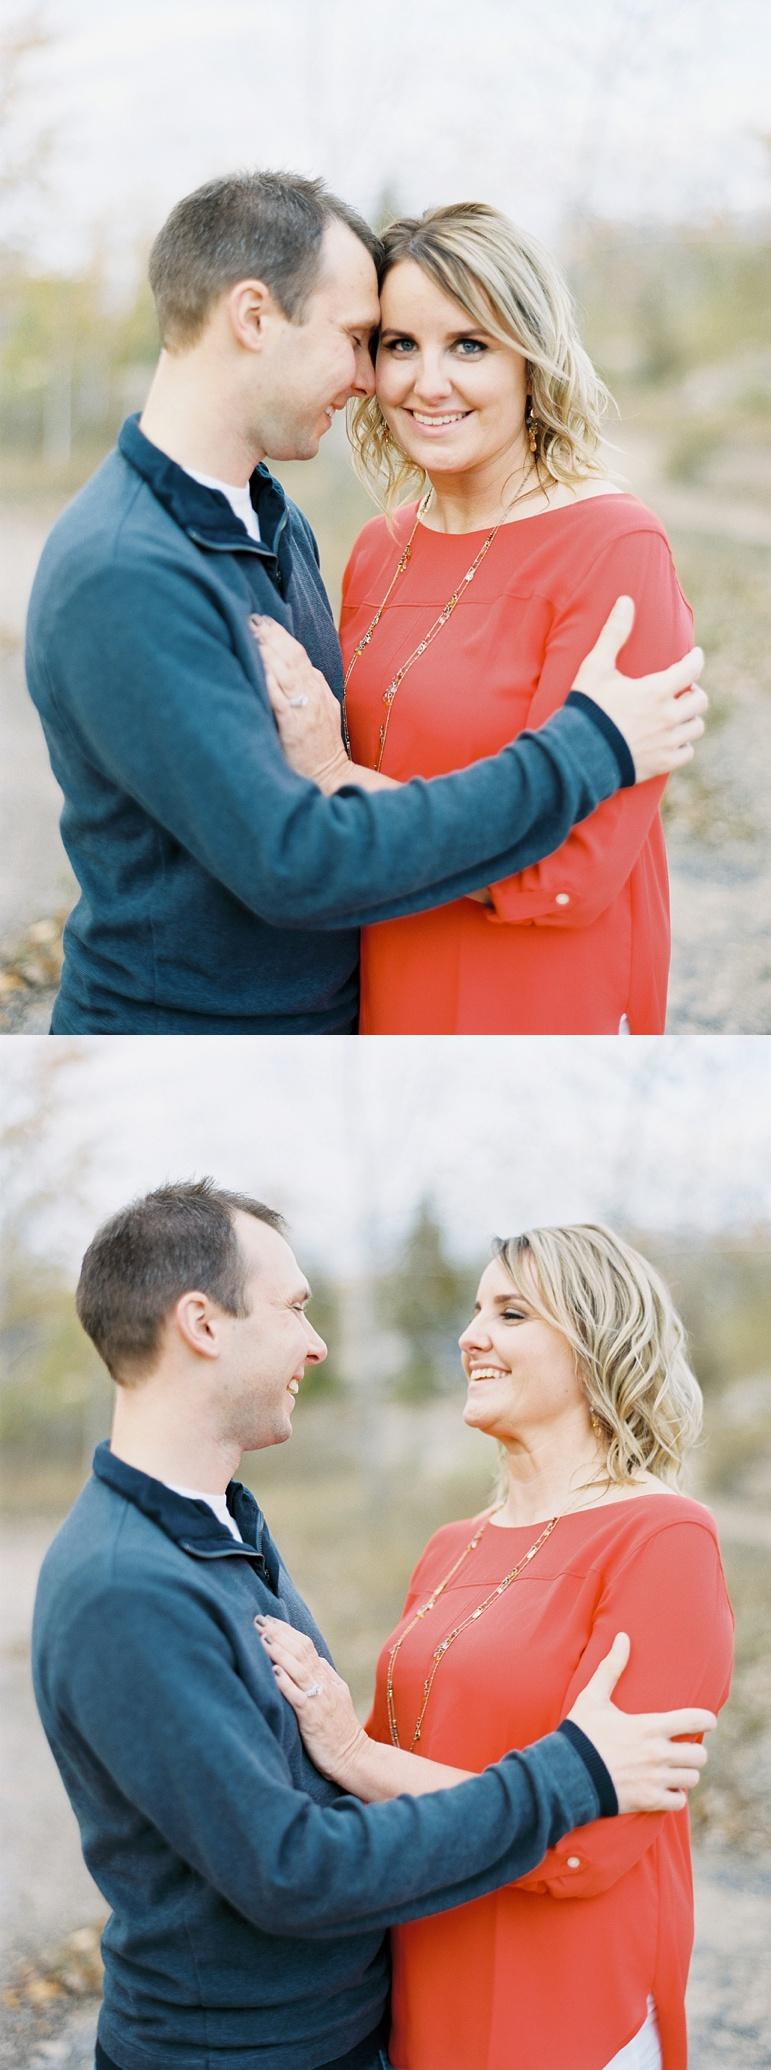 Door County Wedding Photographer, Hill Cliff State Park Engagement Photos, Wisconsin Fall Engagement, Green Bay Wedding, Karen Ann Photography